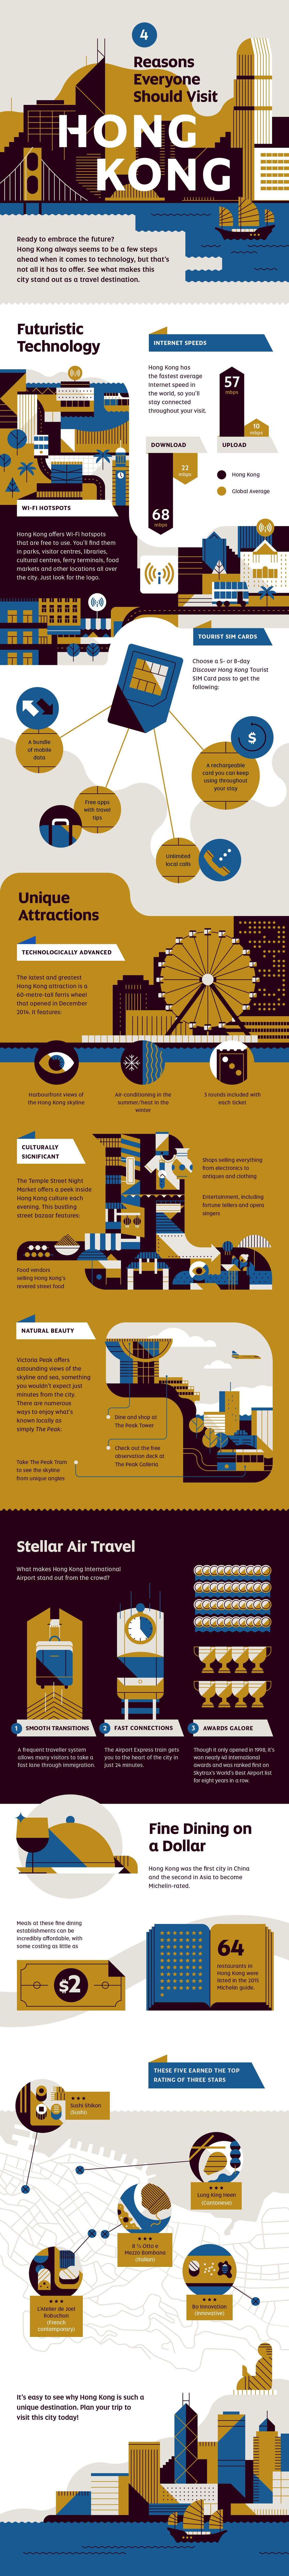 aleksandar-savic_etihad_infographic-hong-kong